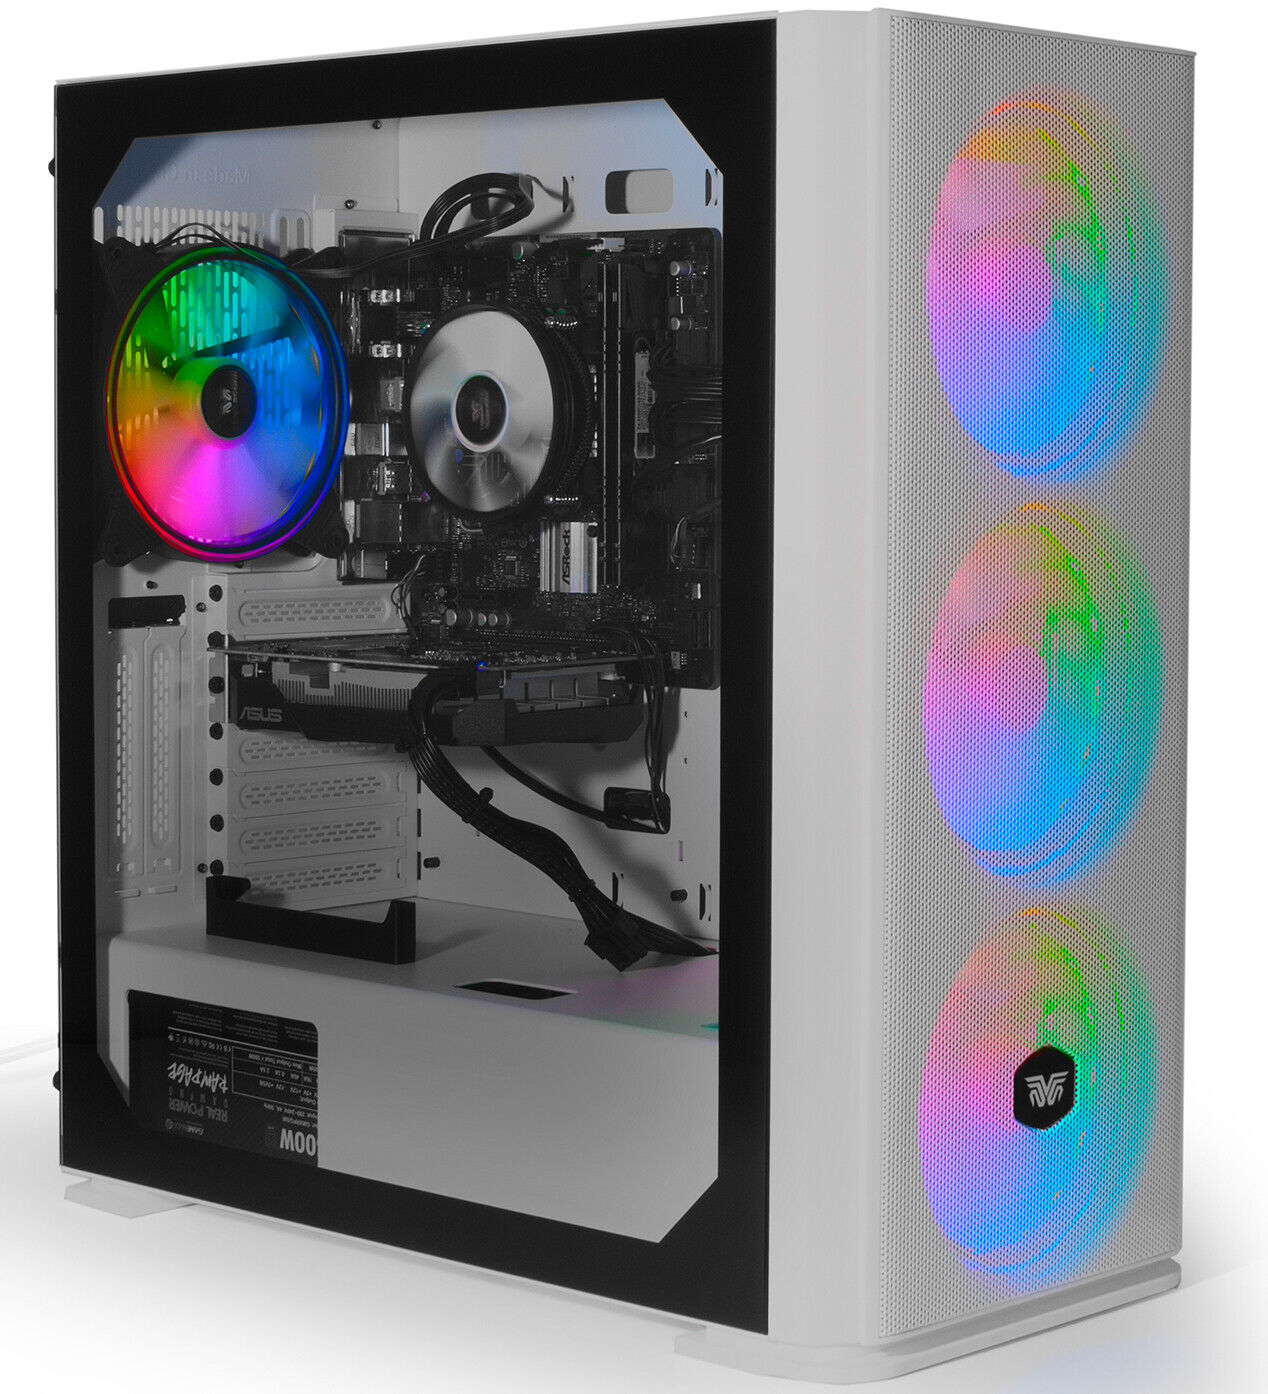 Computer Games - Veno Gaming PC Computer Intel Quad i3 8GB RAM 500GB HDD WINDOWS 10 2GB GT710 FR